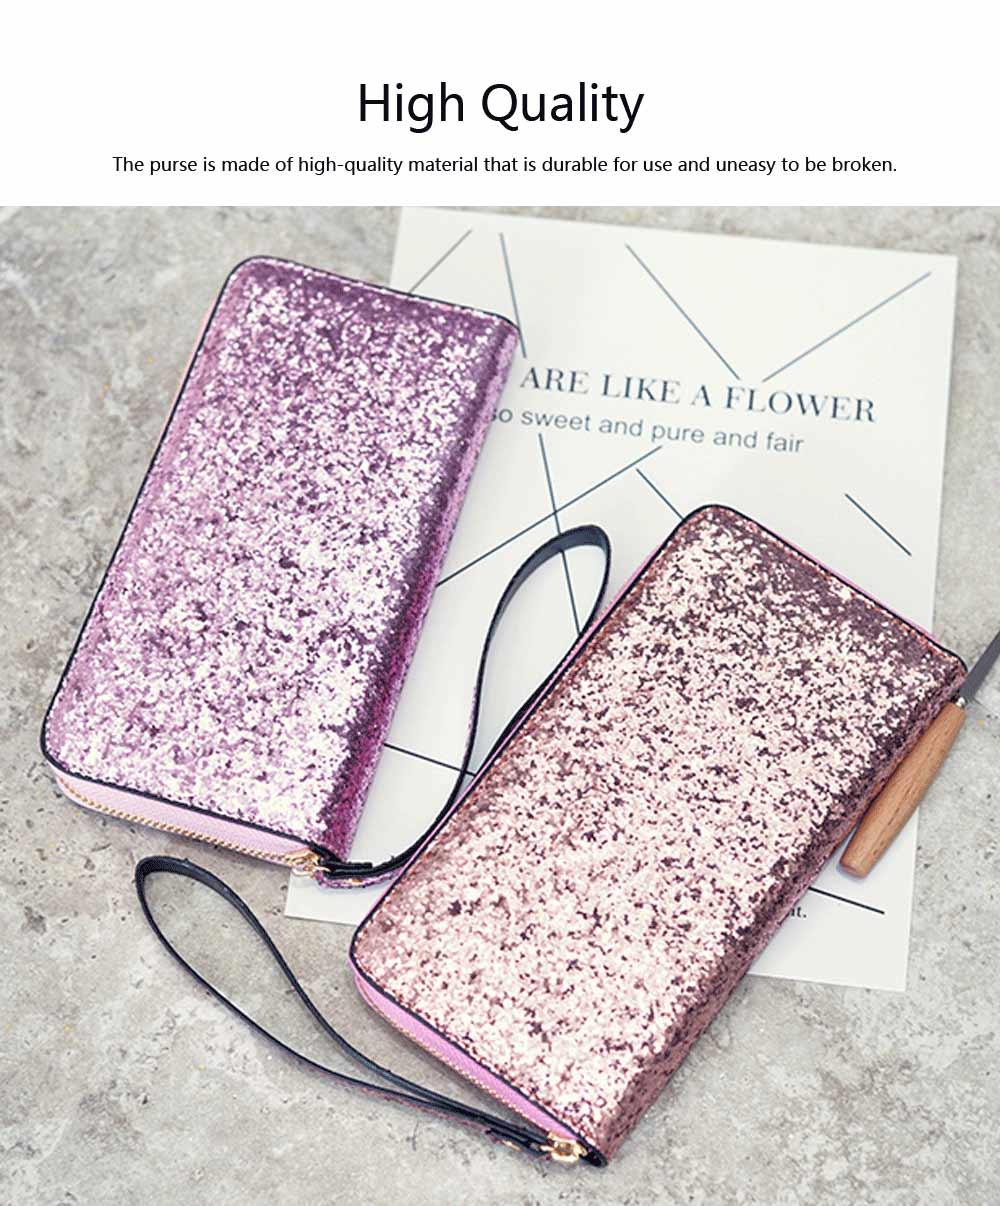 2019 Newest Evening Hand Bag Paillette Purse for Women Lady Girl, Fashionable Long Style Purse, Hand Clutch Bag, Simple Classic Purse 4 Colors 5